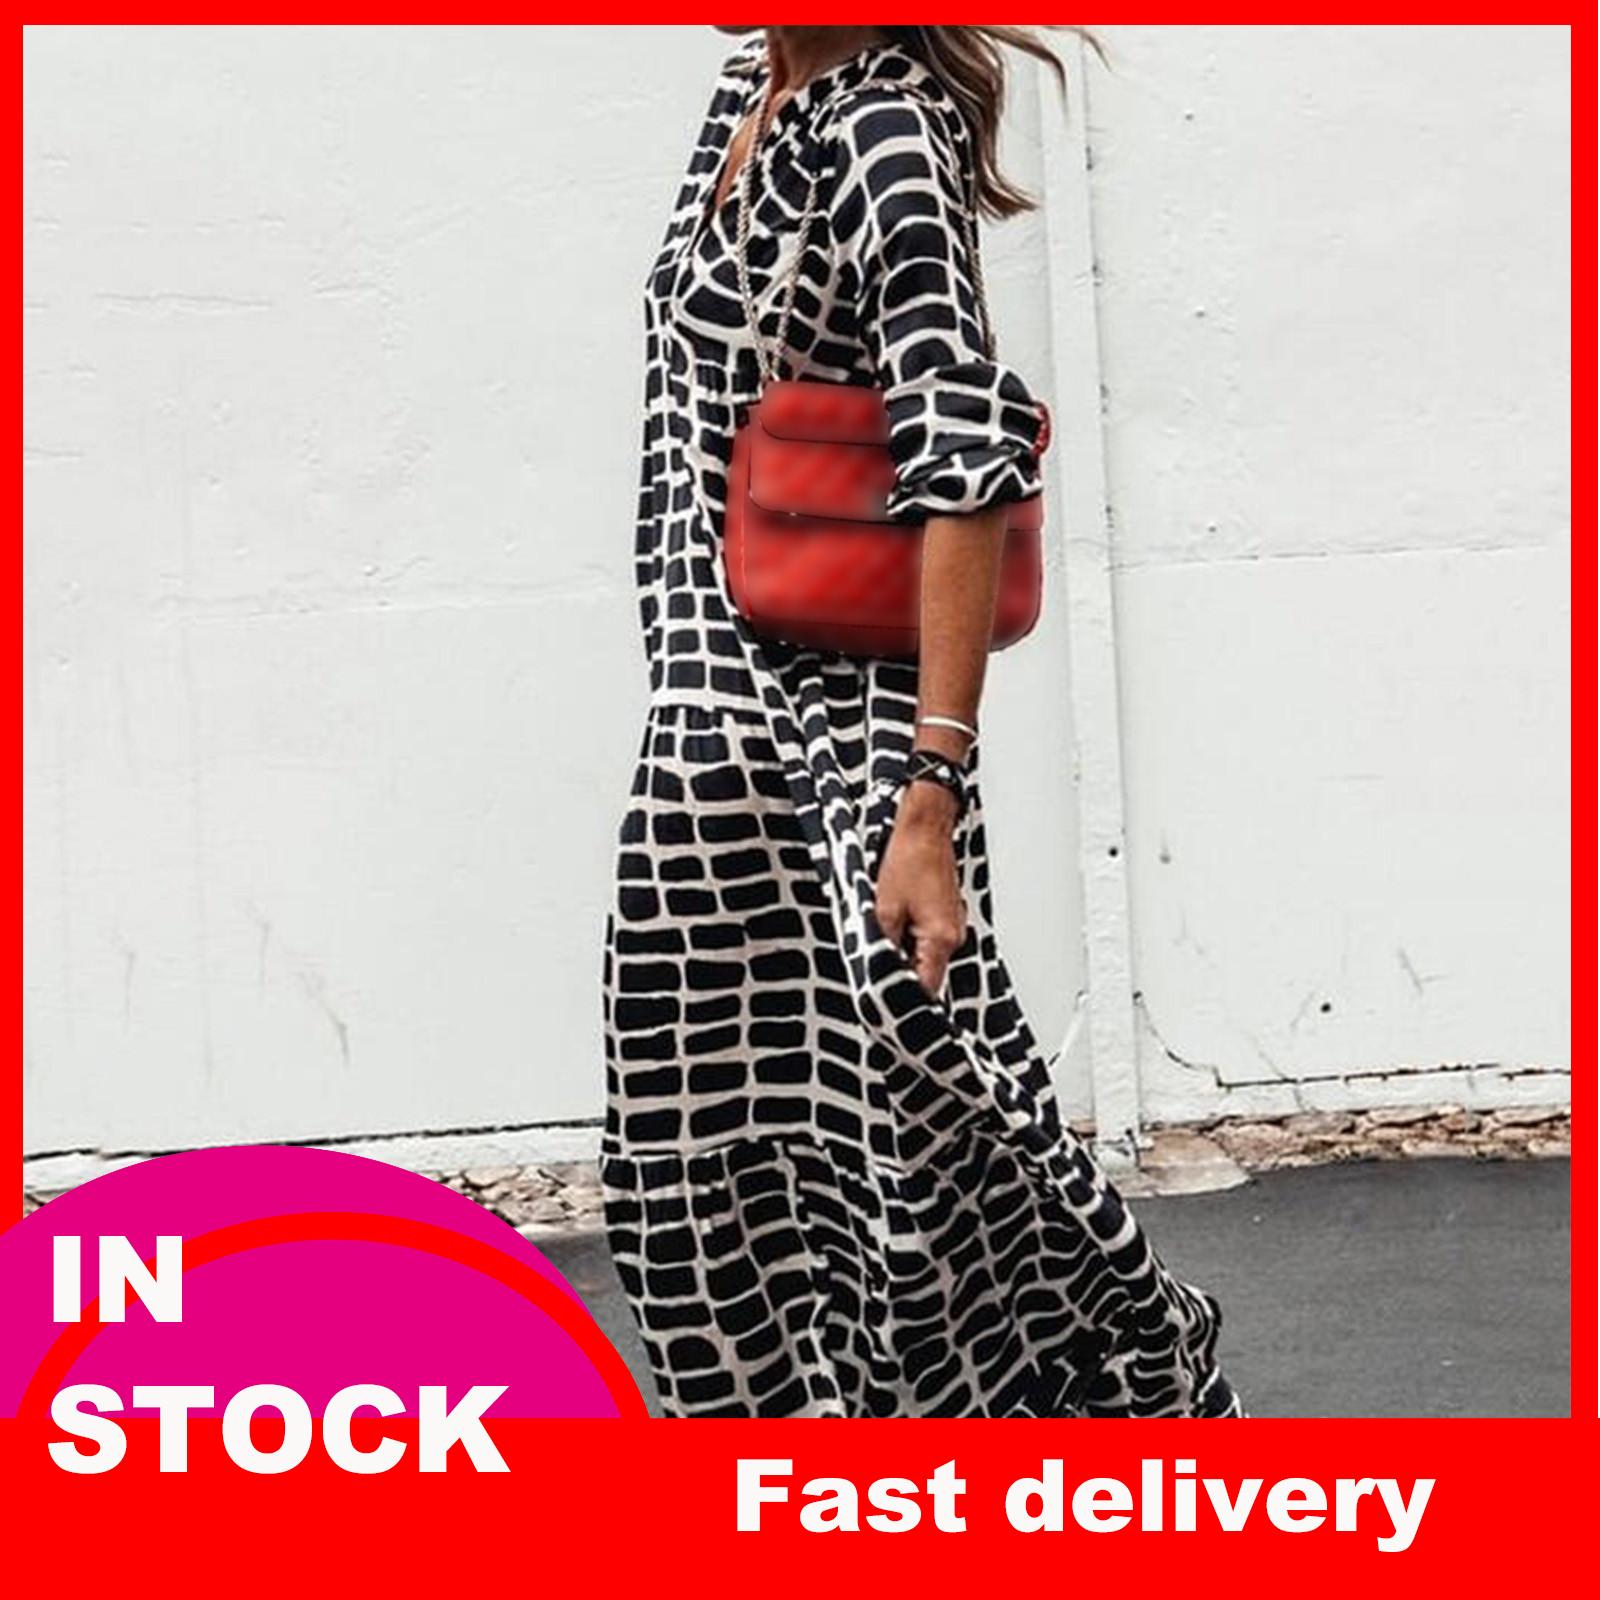 4# Printed Leopard Dress Woman V neck Swing Long Sleeve Dress Floor length Dress Vetement Femme 2021 Robe Femme Платье Летнее